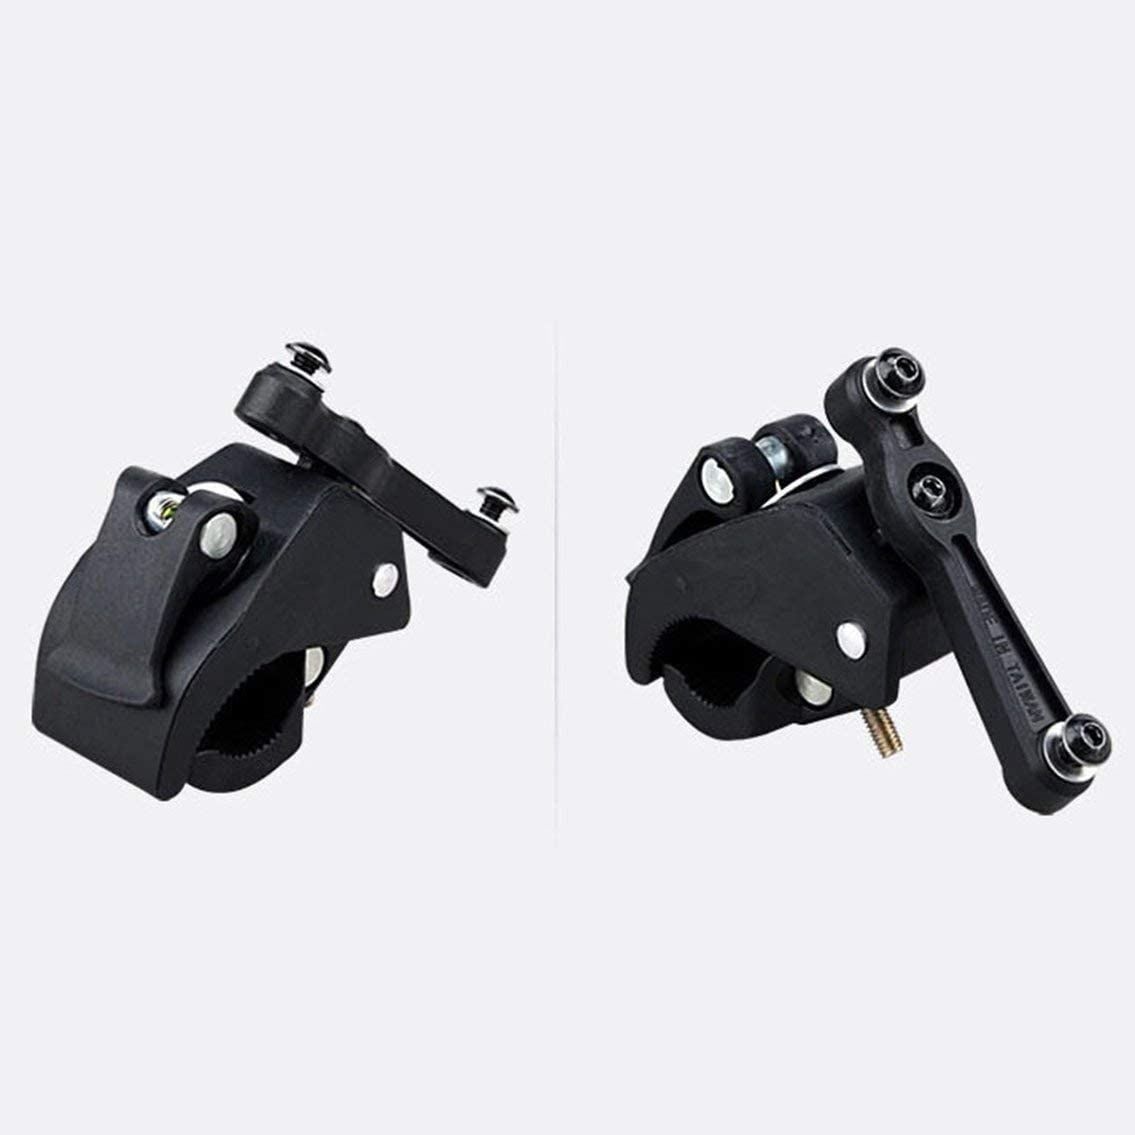 Panamar Adaptador Universal para Portabid/ón para Bicicleta Negro